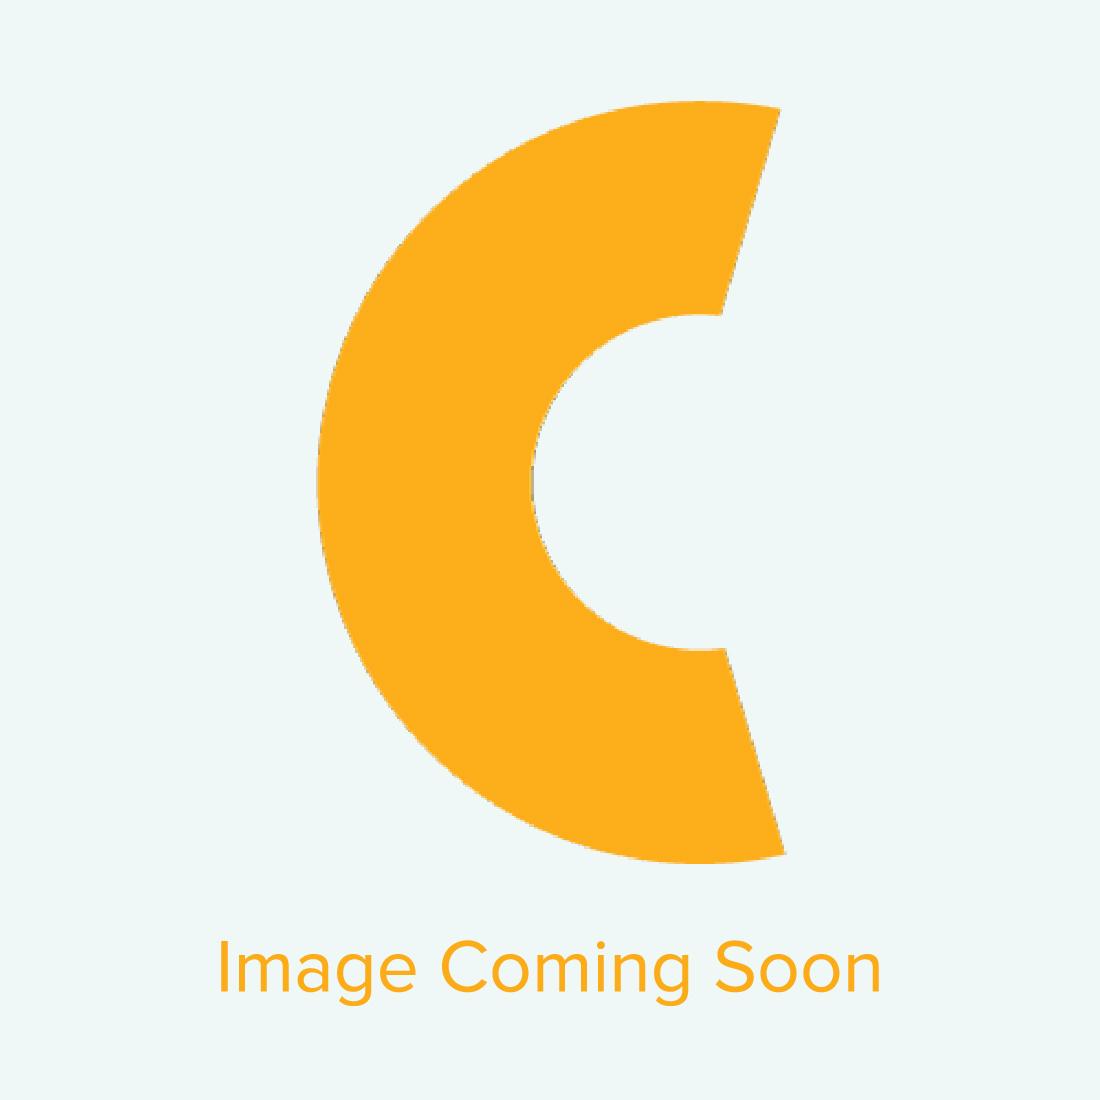 "Image Clip Laser Light Heat Transfer Paper for Laser Printers Sample Pack - 8.5"" x 11"""